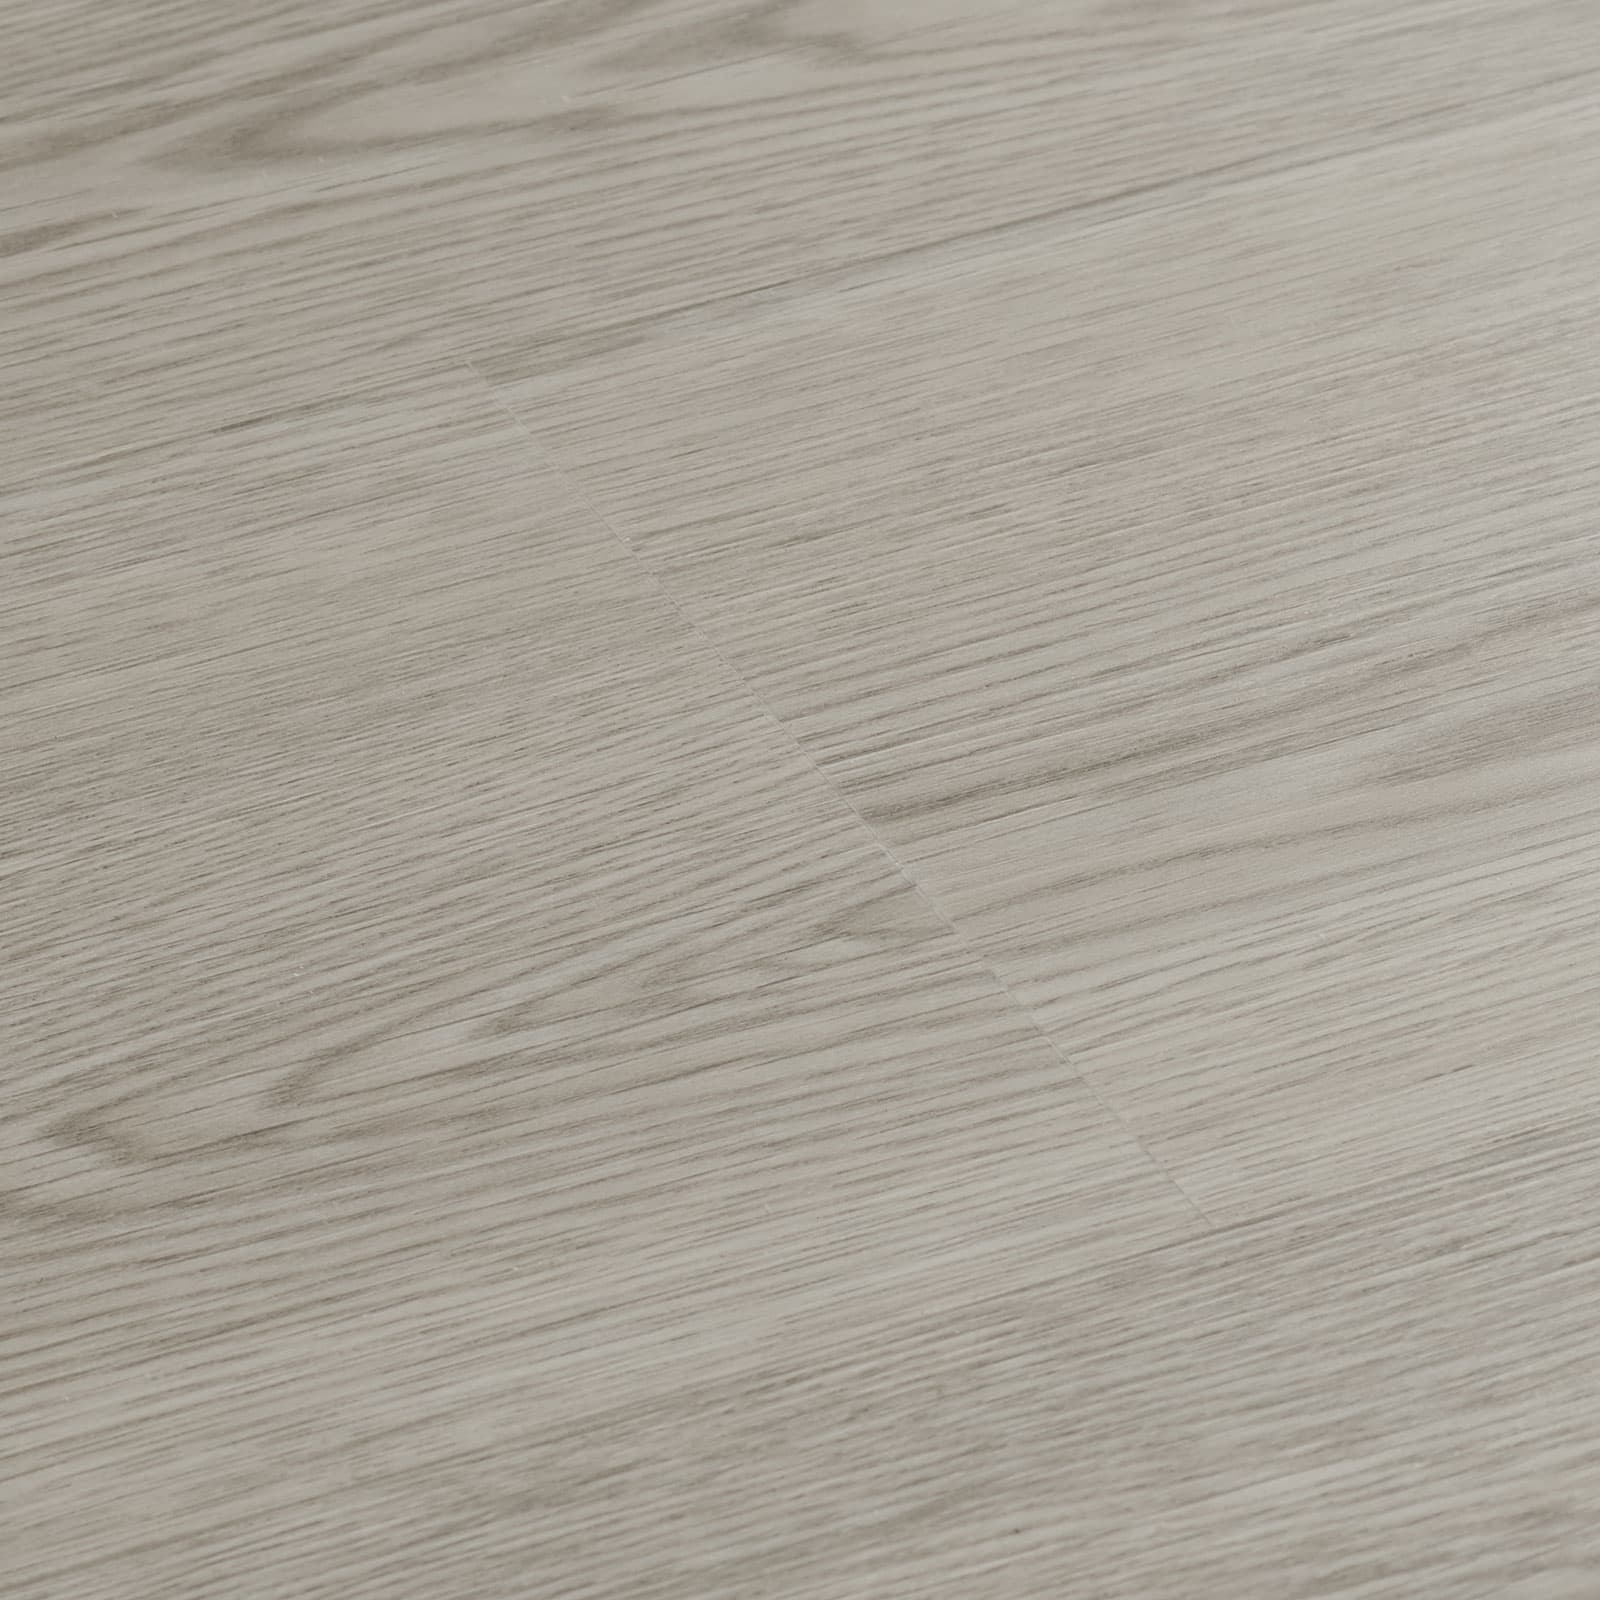 light grey moisture resistant laminate